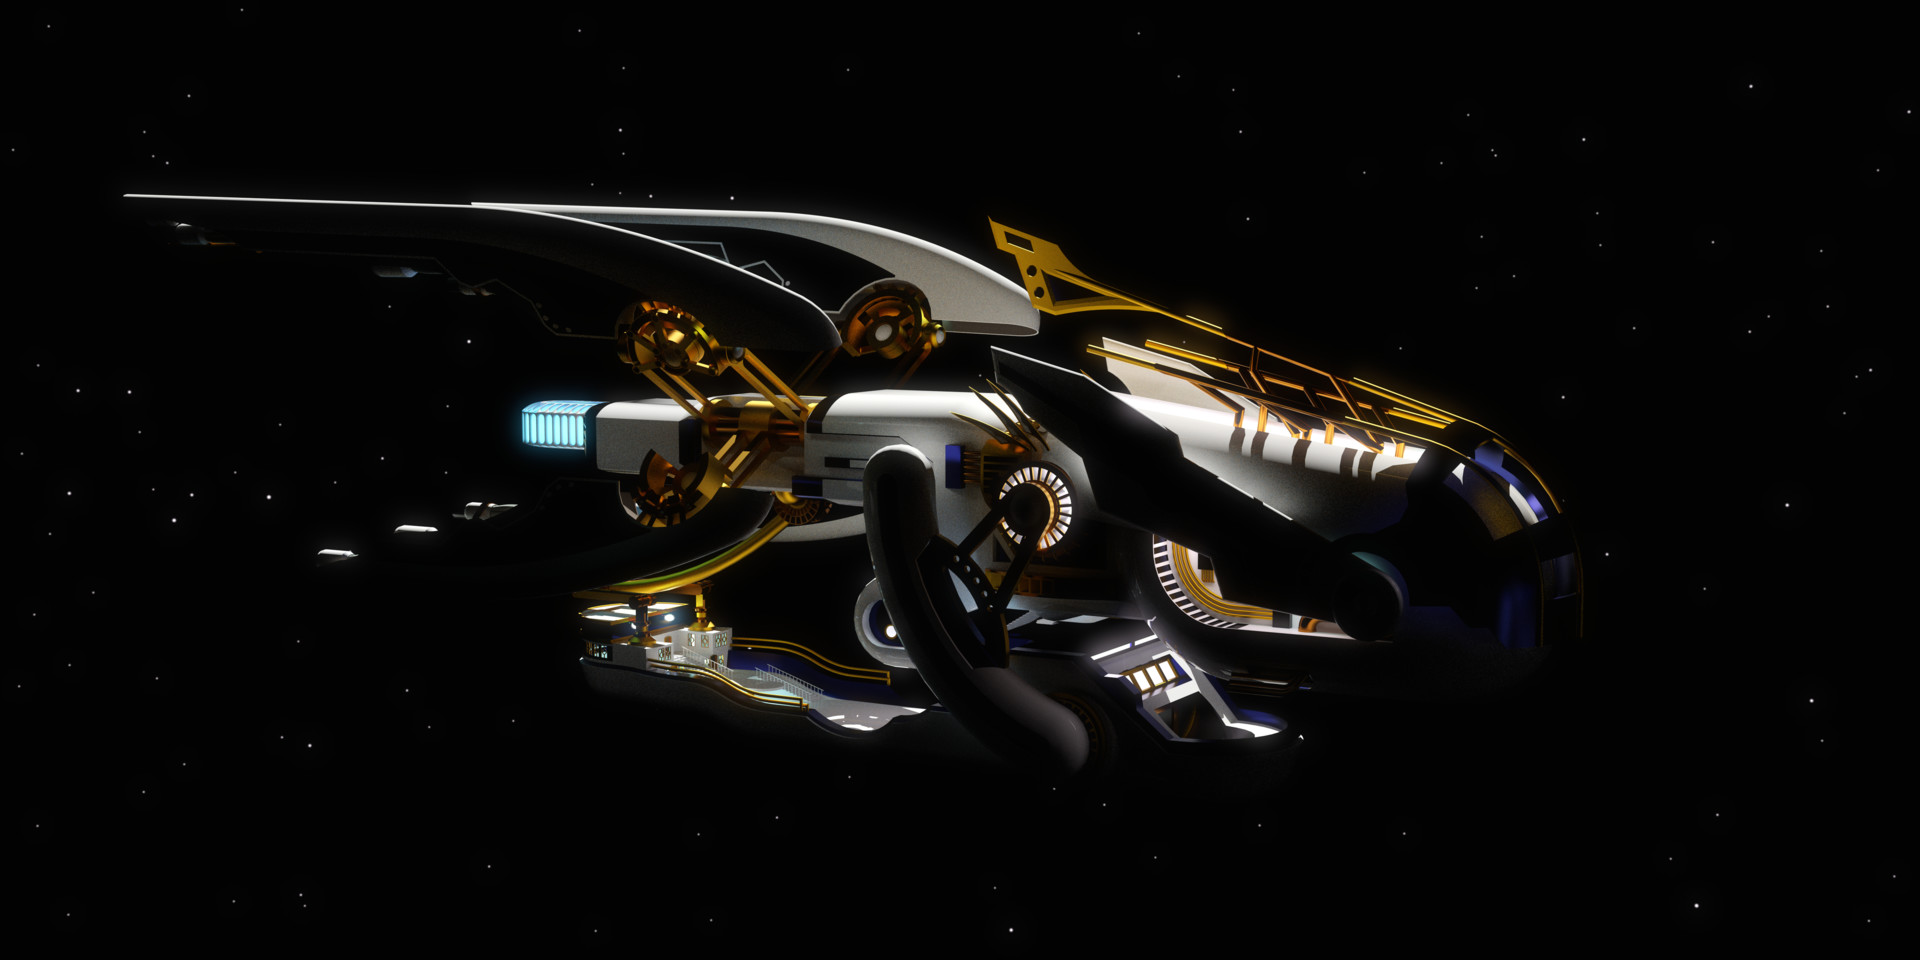 Duane kemp sky orca model by muhammx f scene 04 glare post